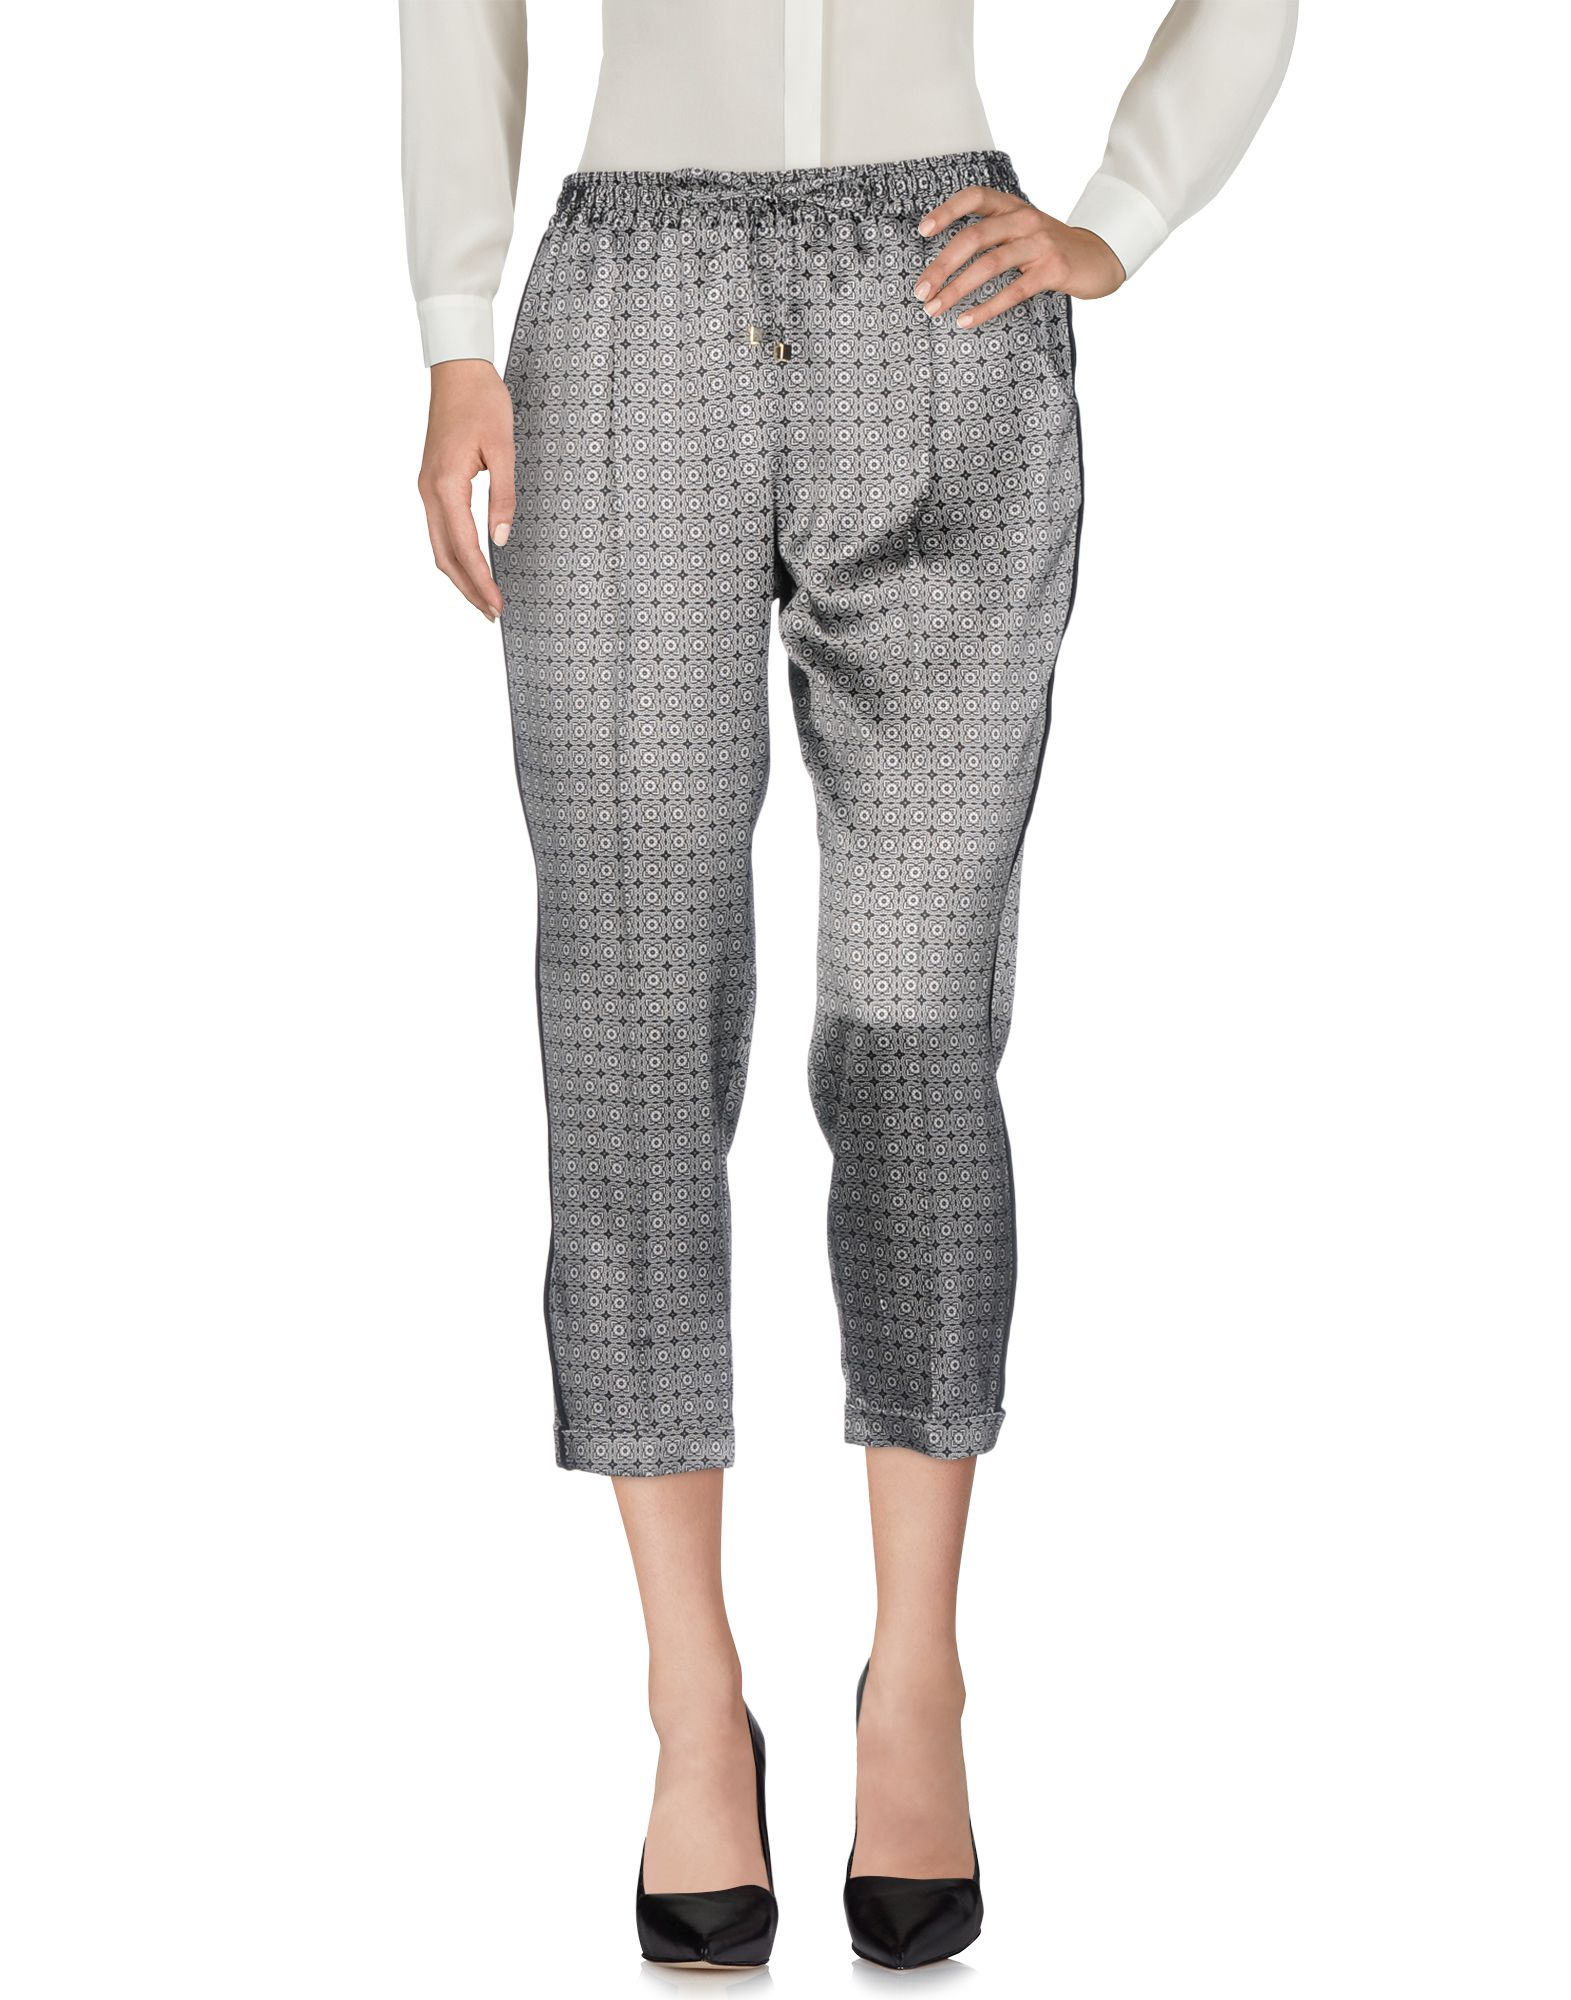 Pantalons À Ligne FemmesAcheter En Kiton LAc4RSq3j5